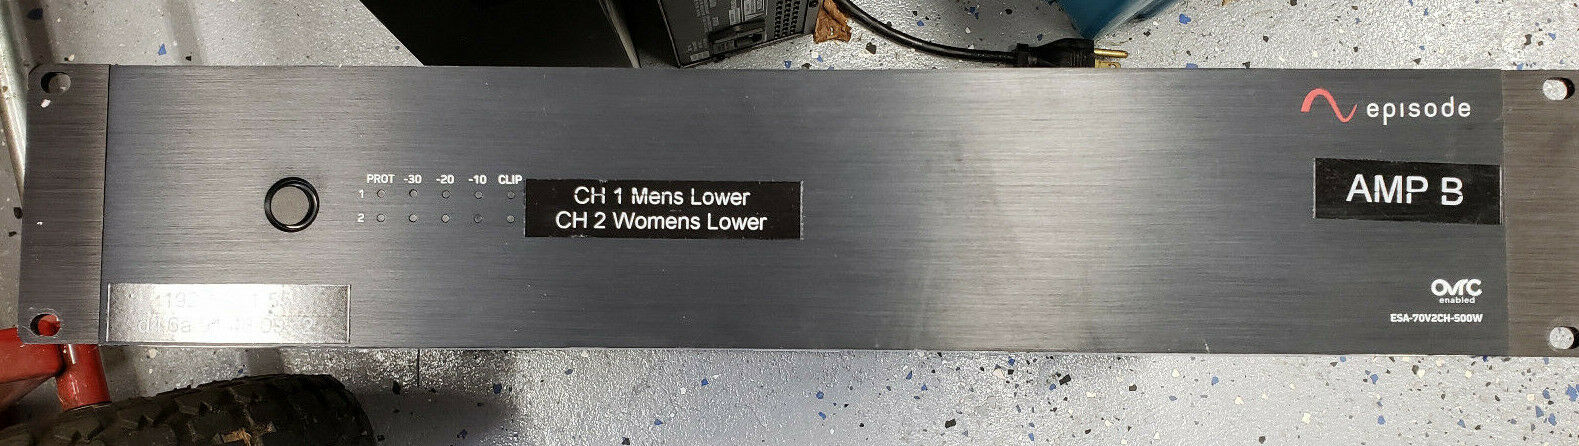 Episode ESA-70V2CH-500W OVRC IP-Enabled Channel Digital Amplifier Mixer 500 Watt